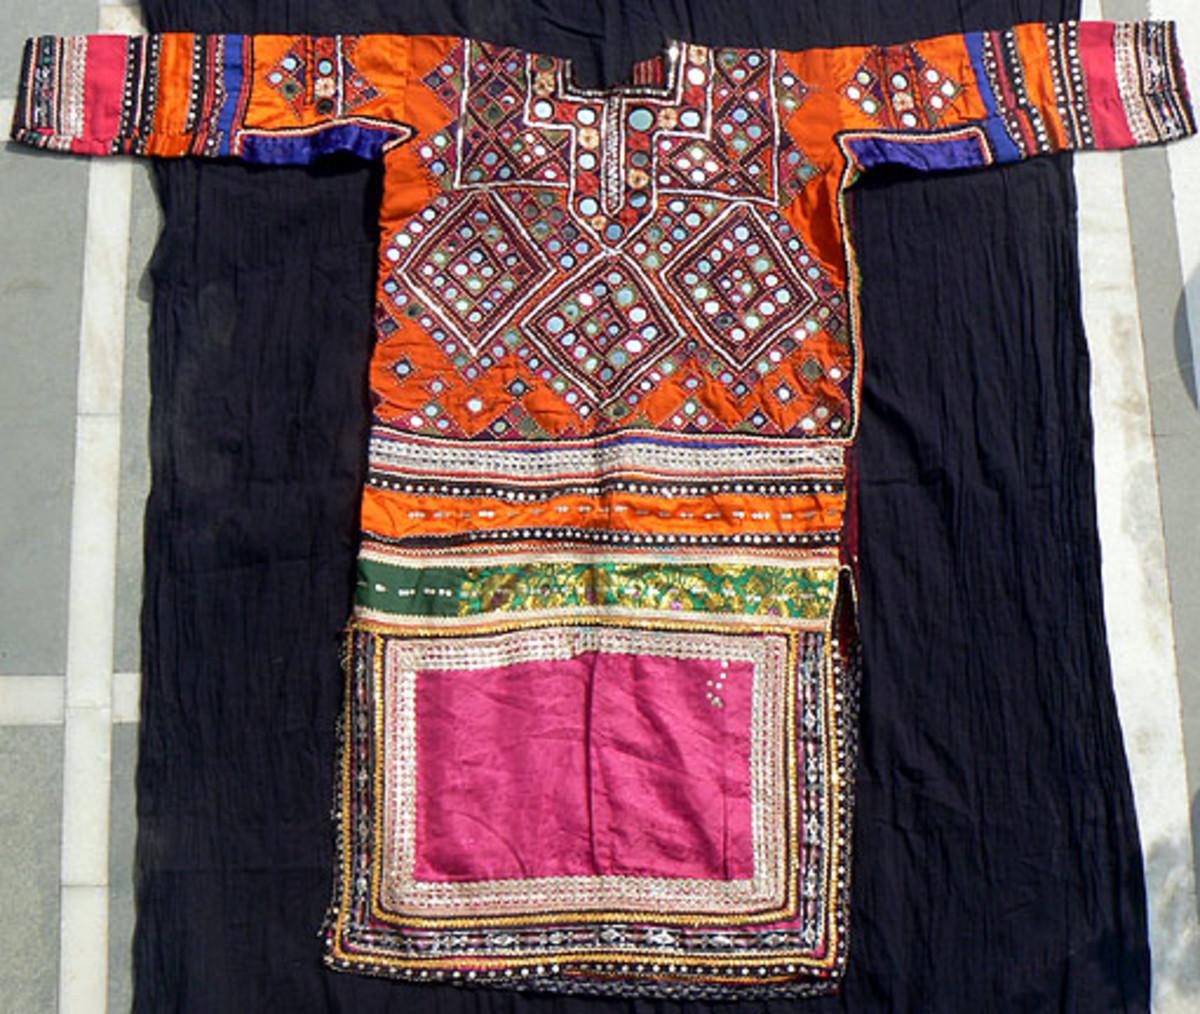 a typical choli